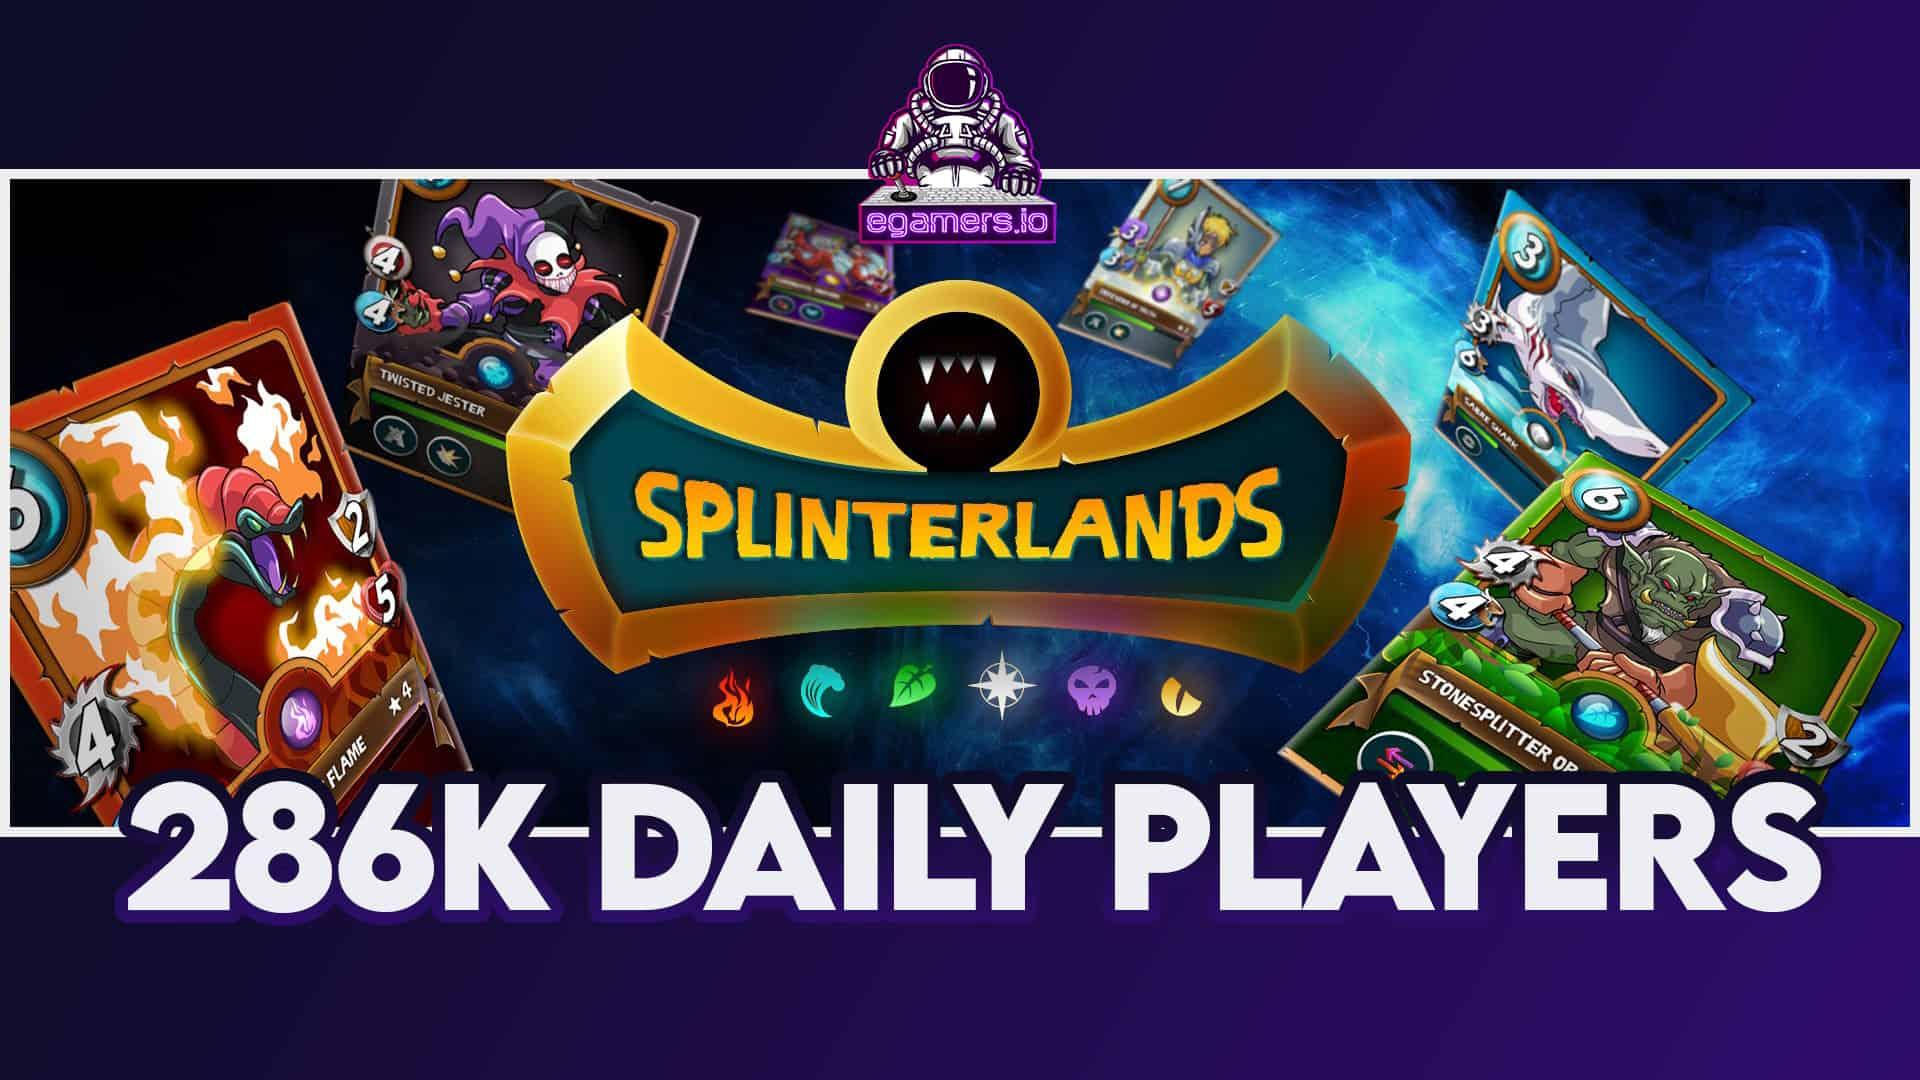 Splinterlands Reaches 286,000 Daily Players